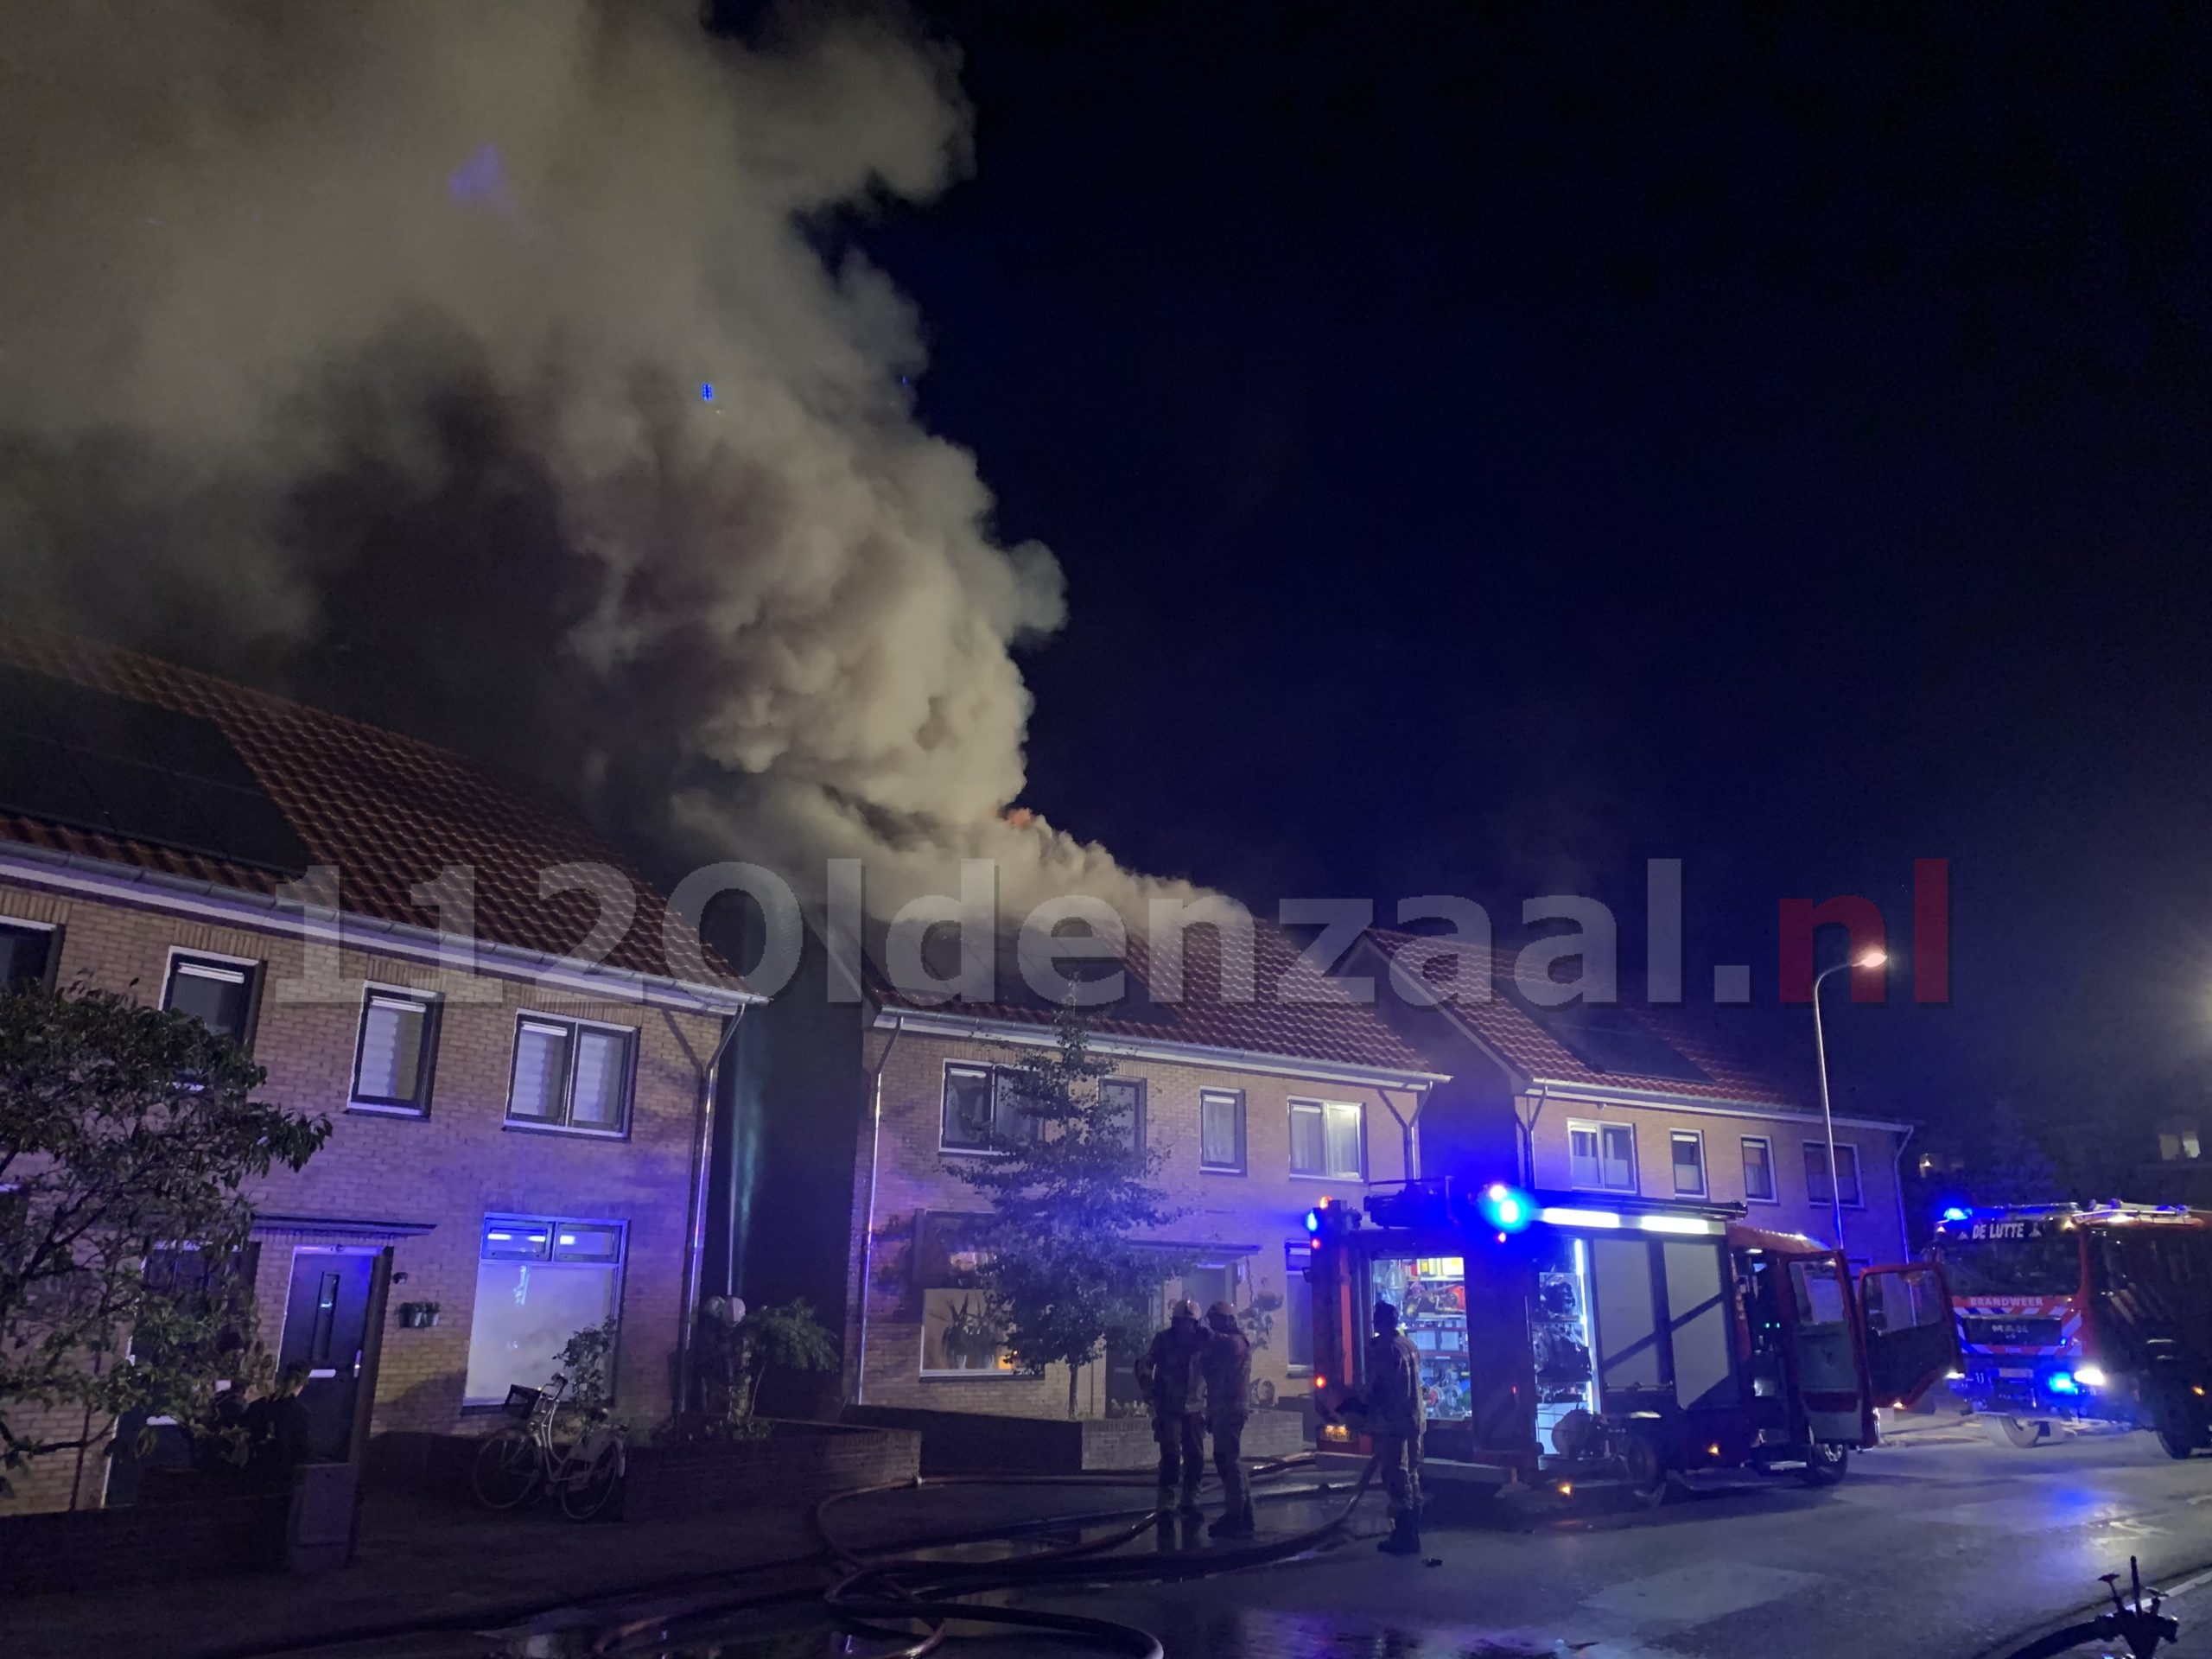 UPDATE: Uitslaande woningbrand Oldenzaal